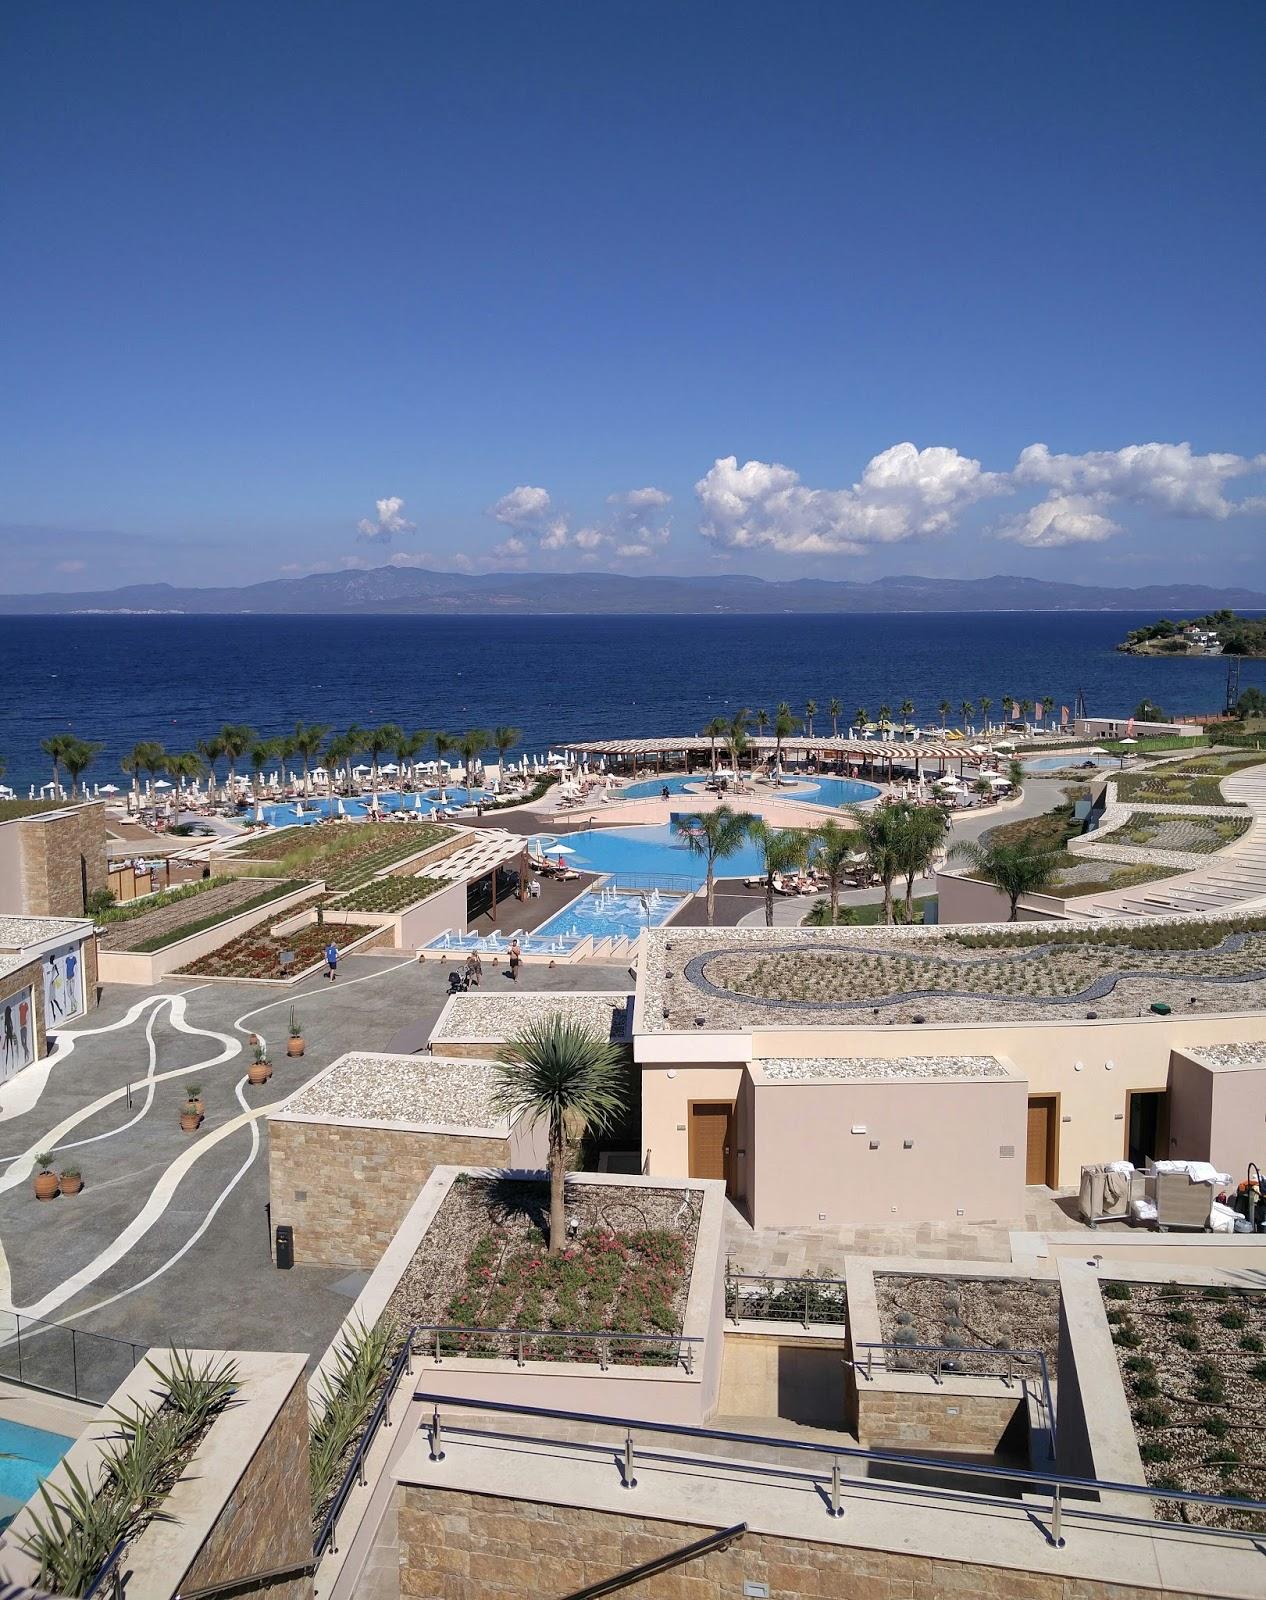 Azure Resort Room Rates